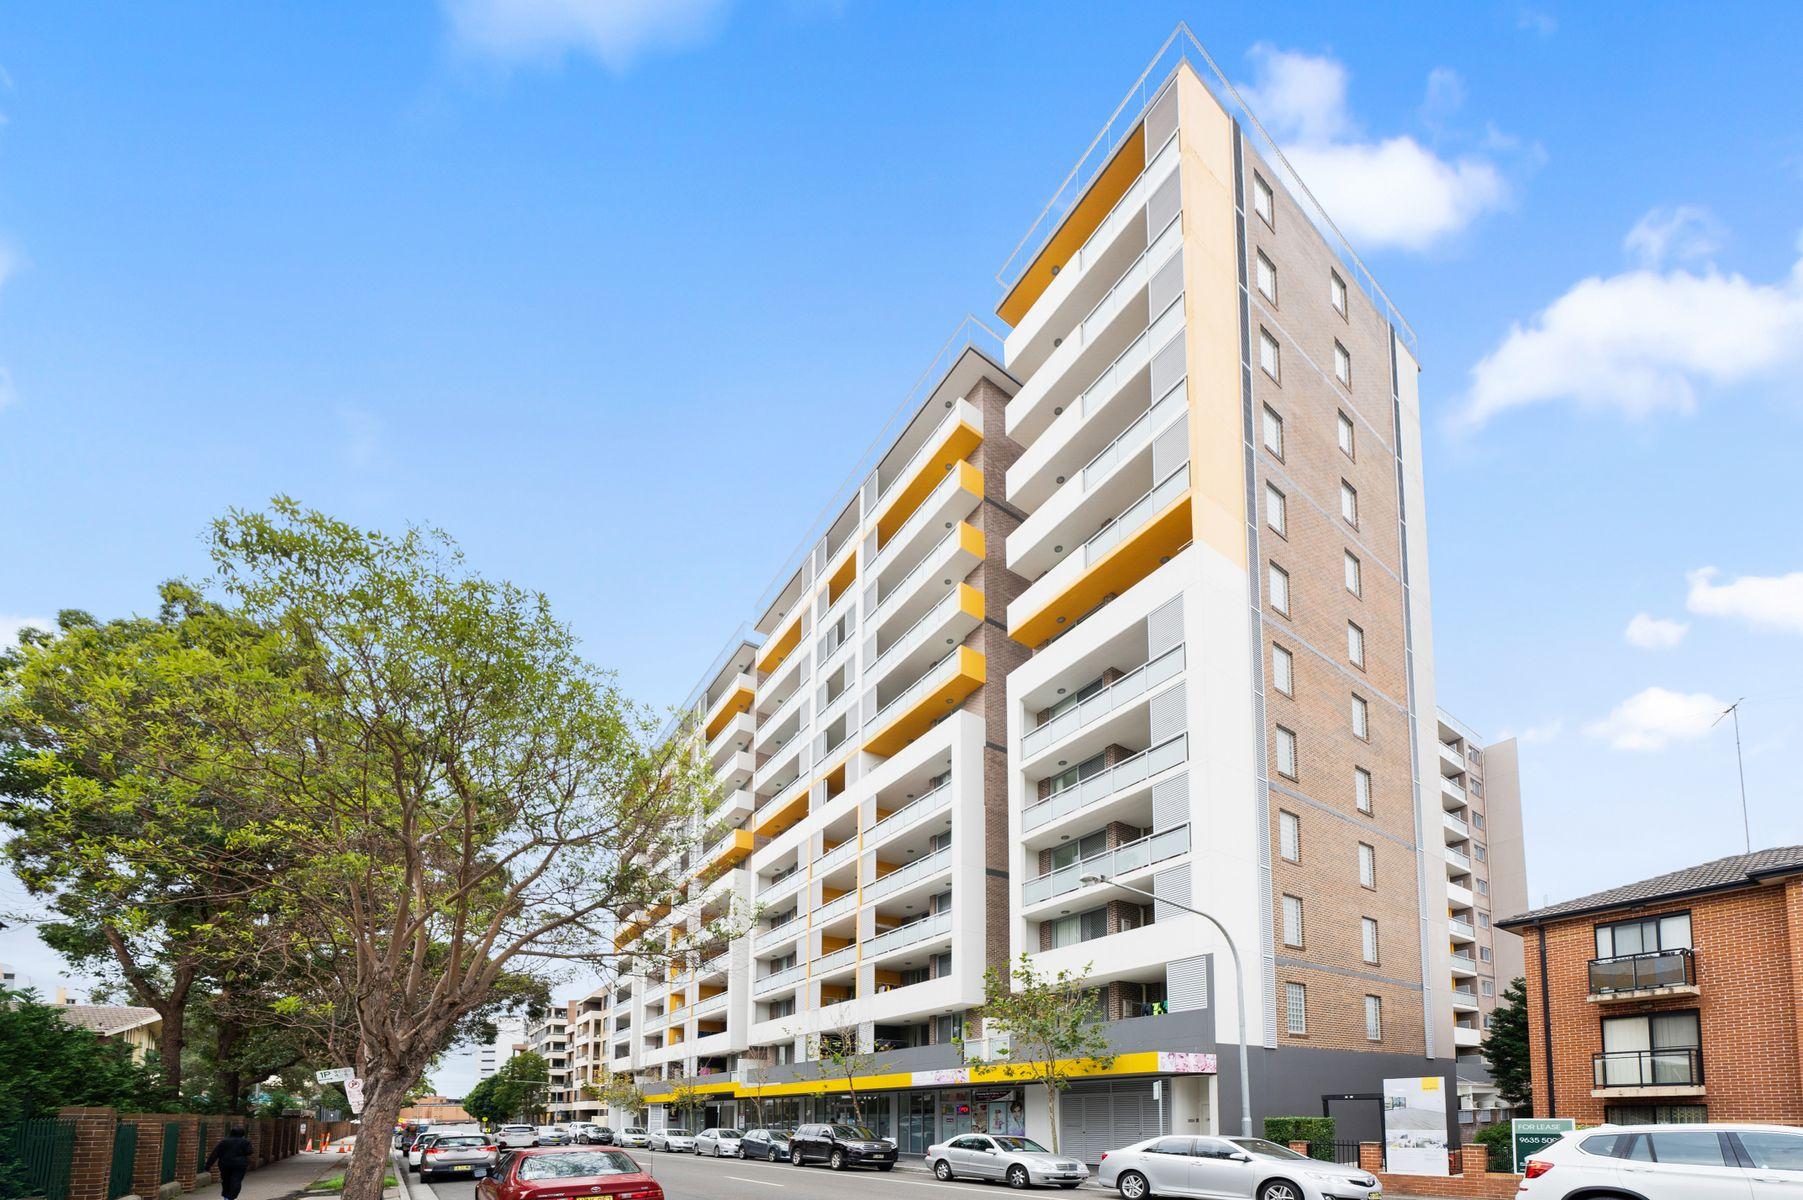 156/6-14 Park Road, Auburn, NSW 2144